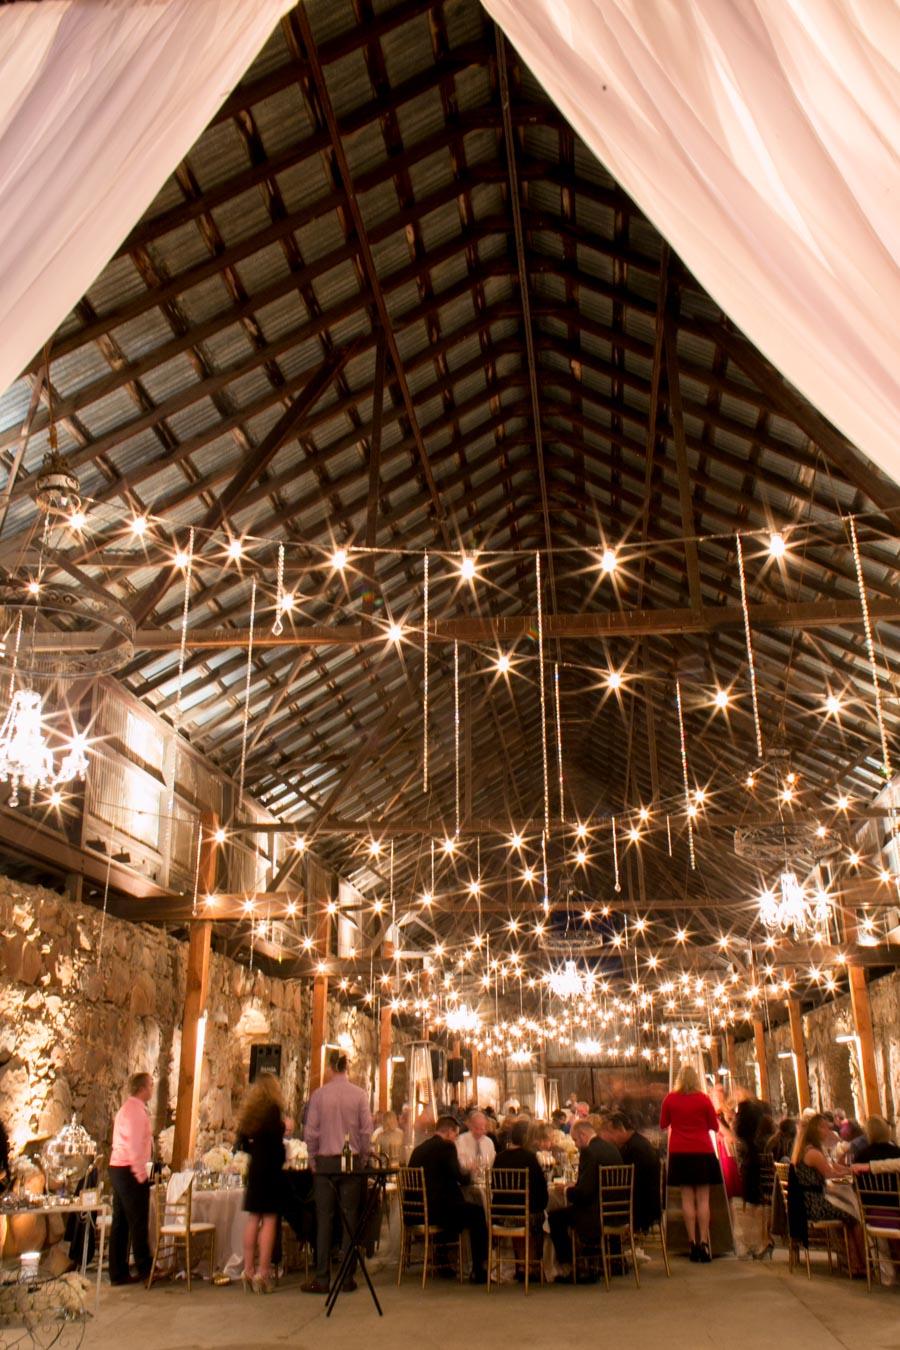 santa margarita ranch wedding reception barn